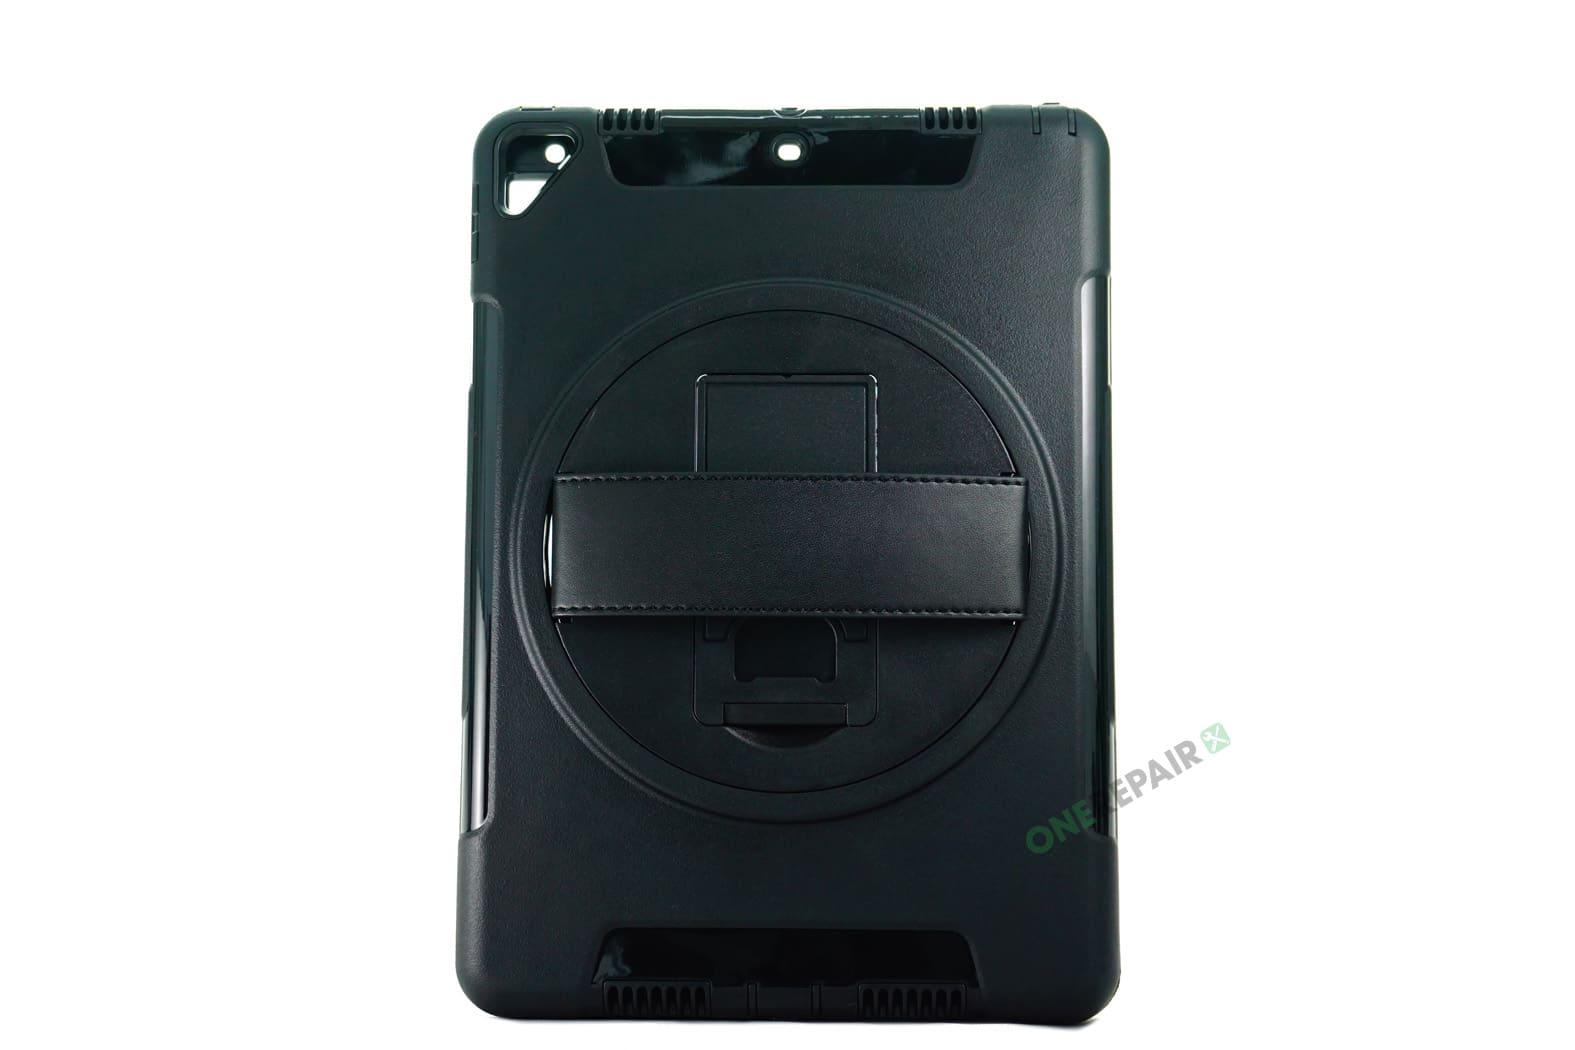 iPad Pro 10 / Air 3, Sort Hardcase cover, børne cover, skole